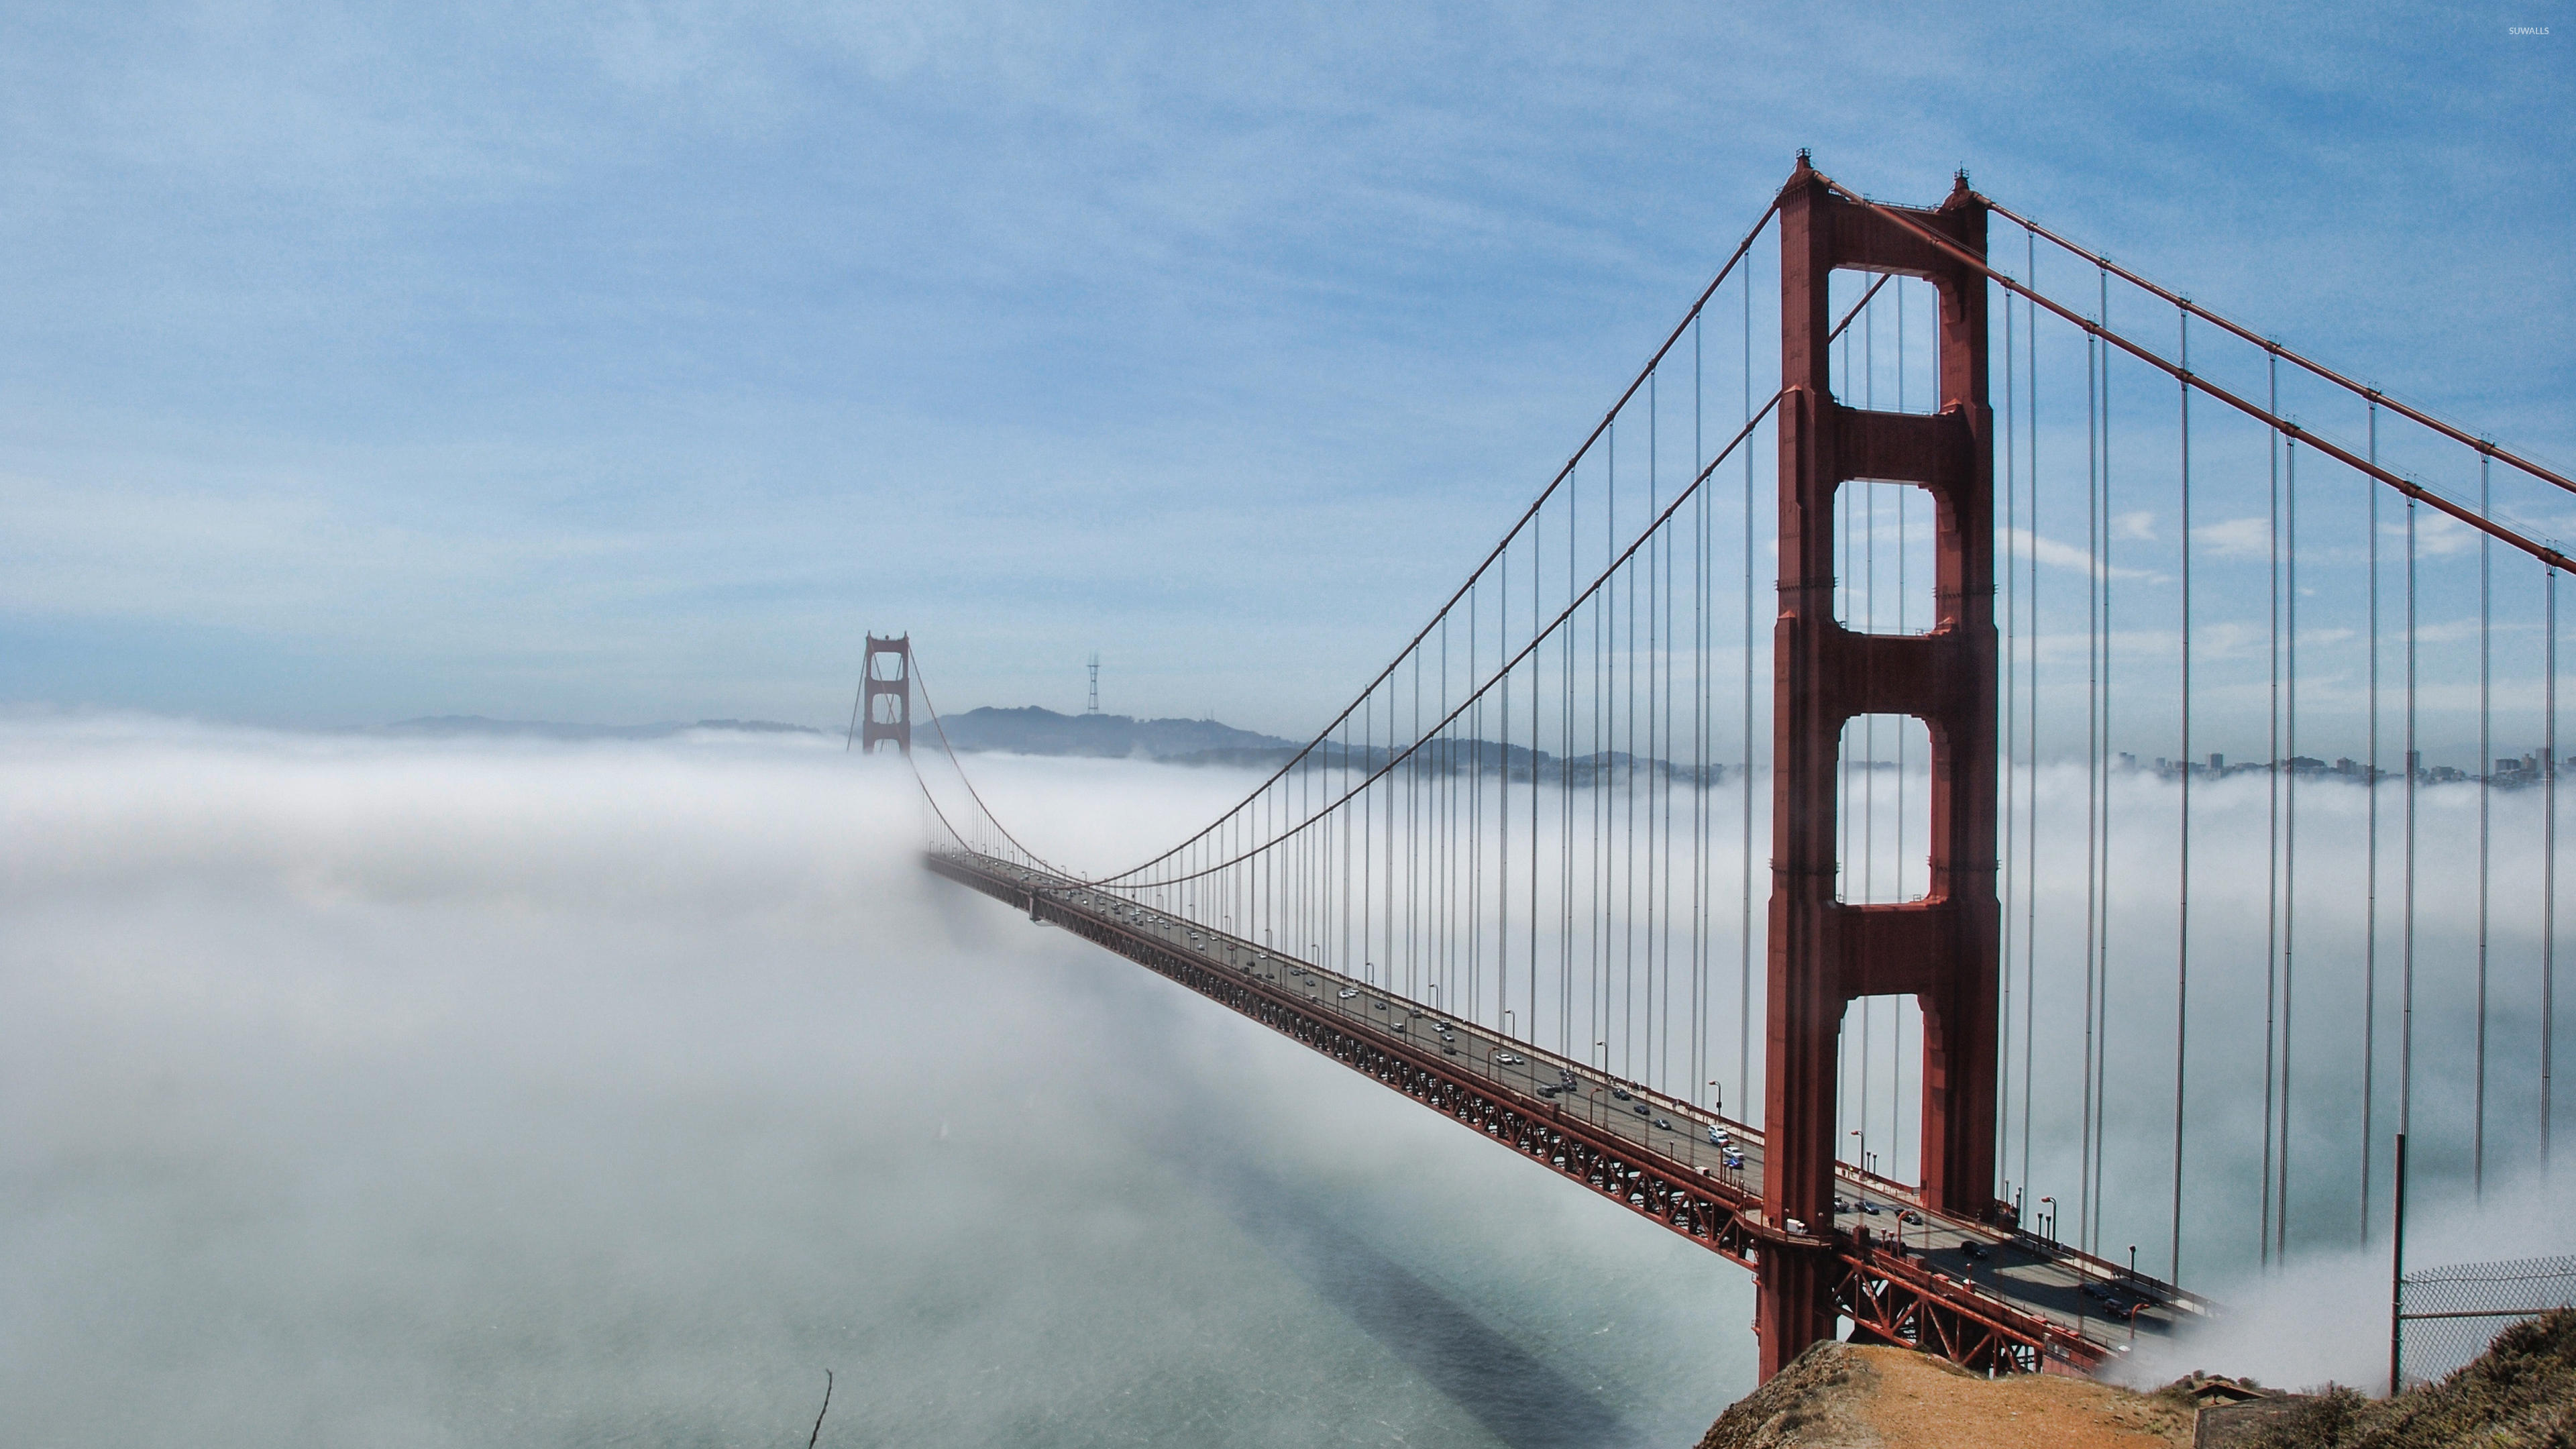 Golden Gate Bridge lost in the fog